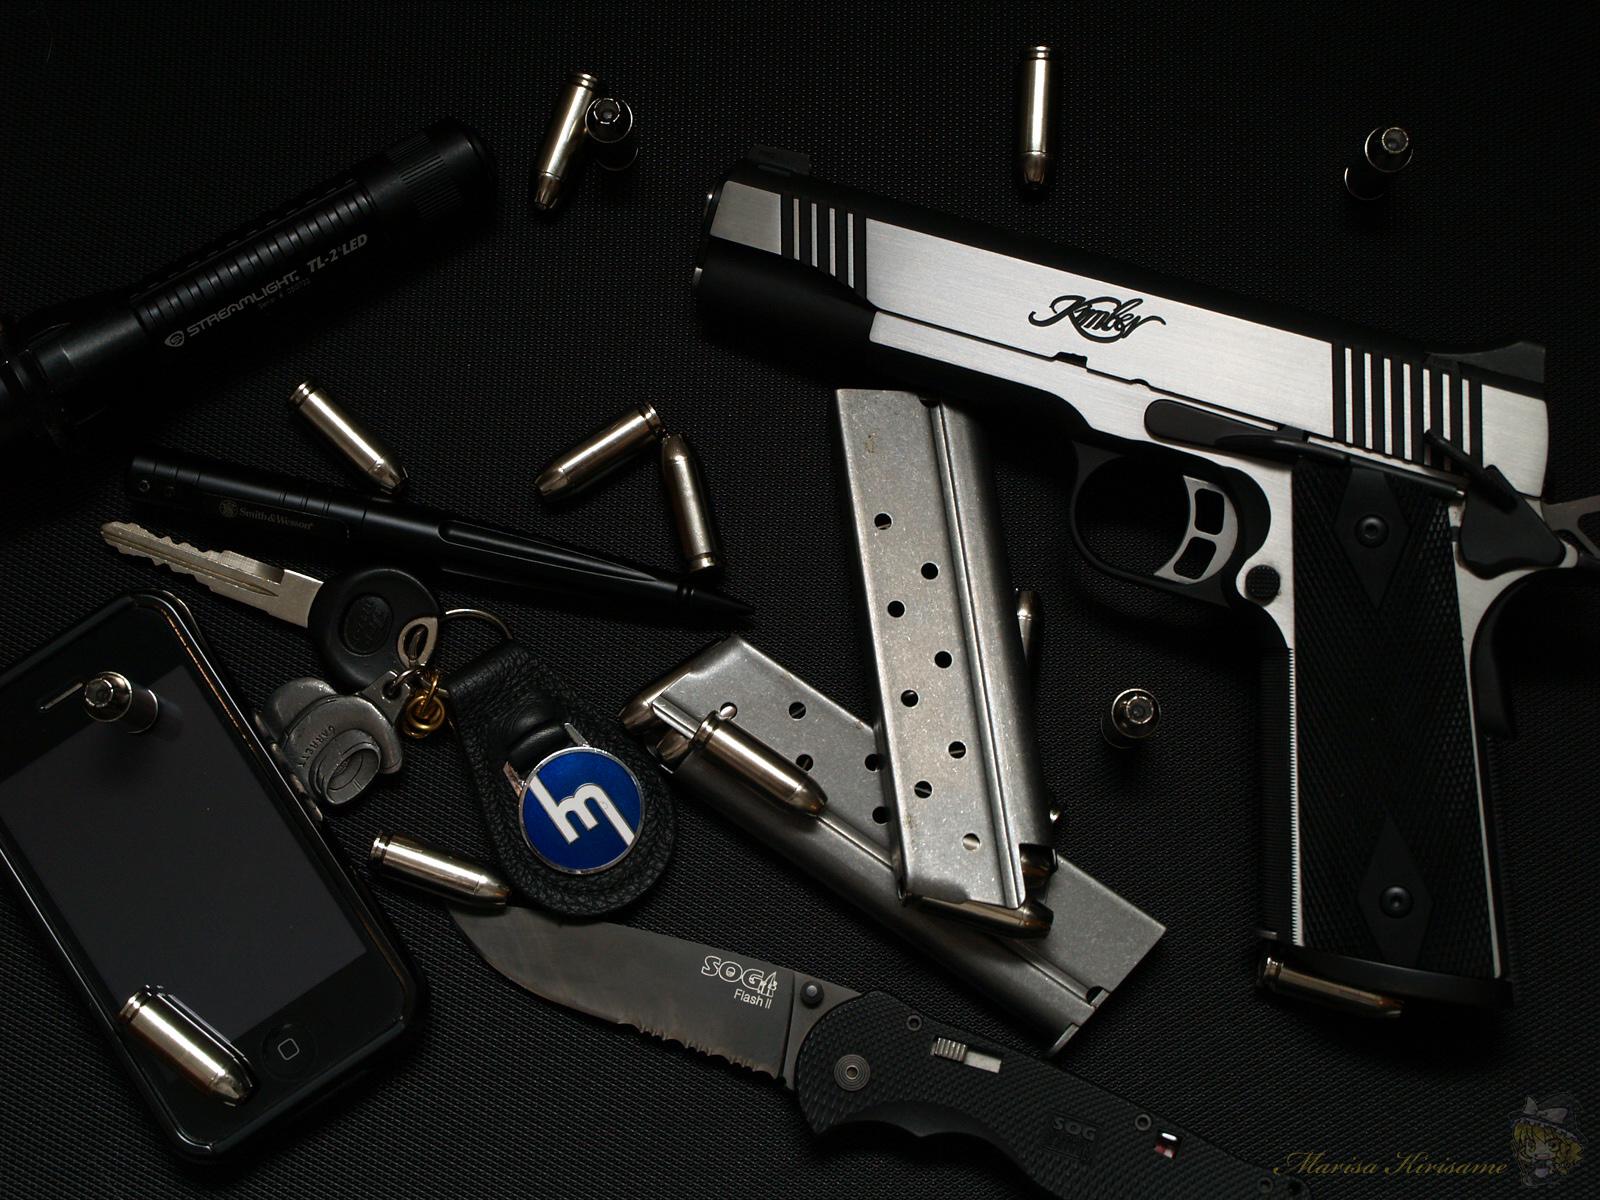 76+] Cool Guns Wallpaper on WallpaperSafari